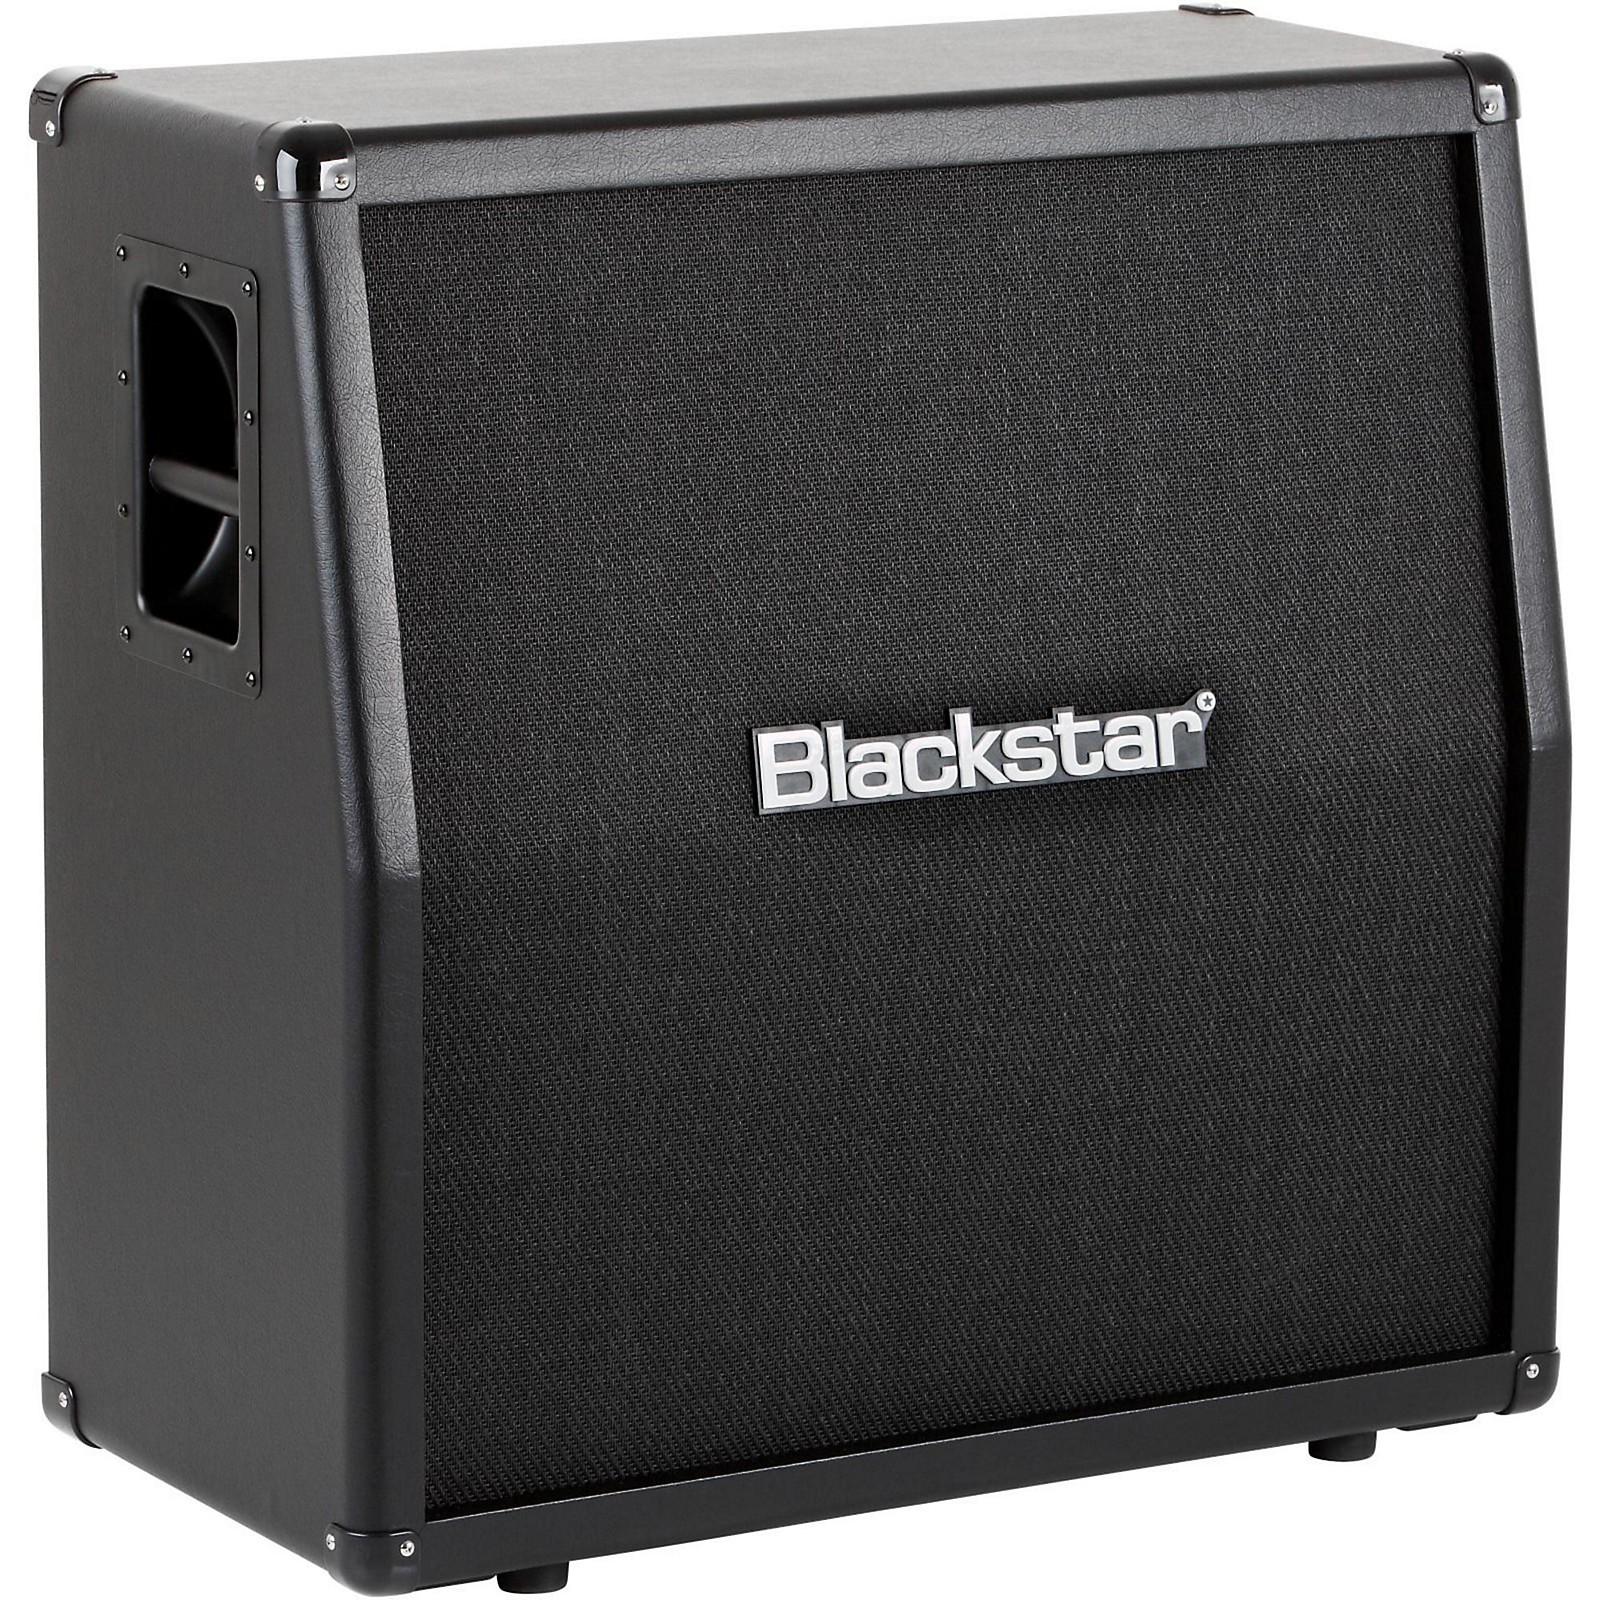 Blackstar ID Series 4X12 Angled Guitar Cabinet